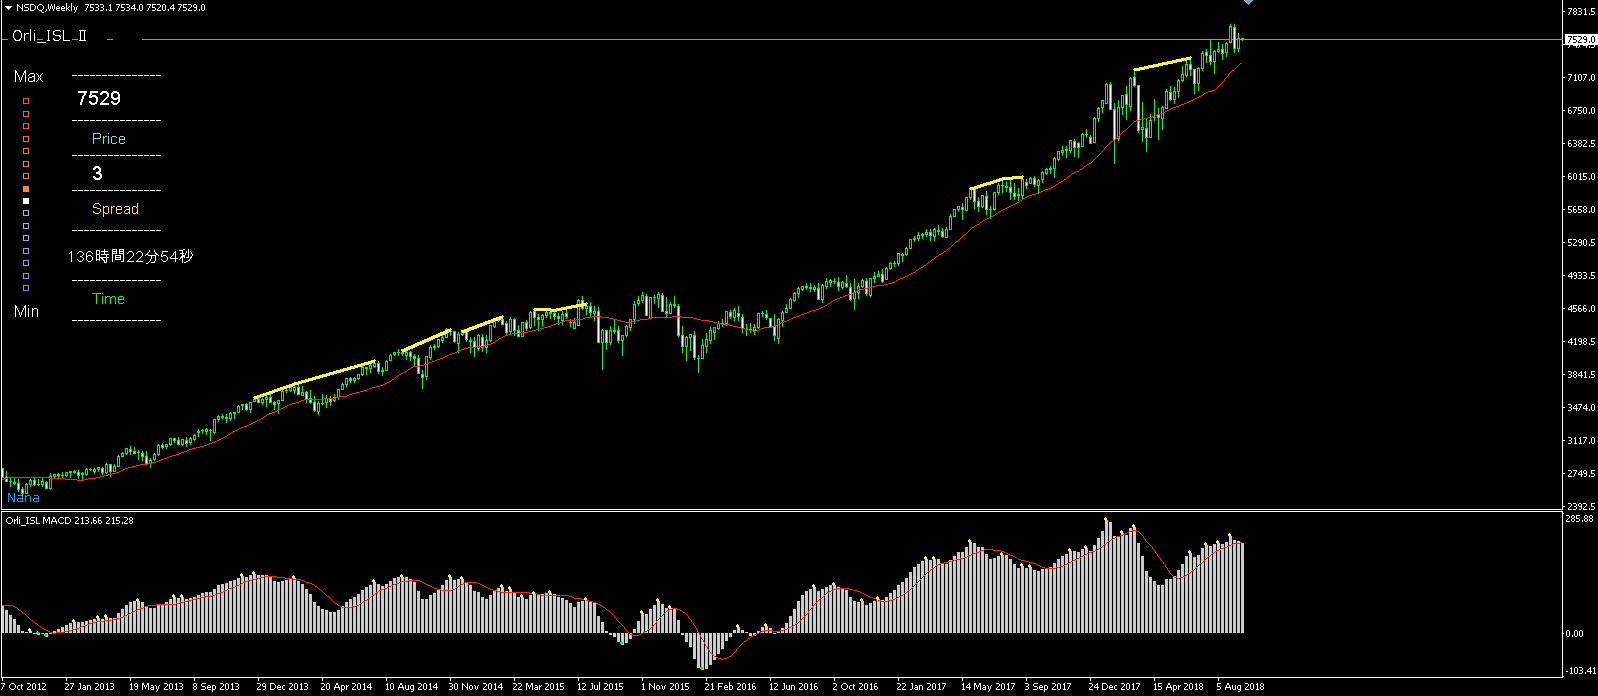 nsdq_chart2.png